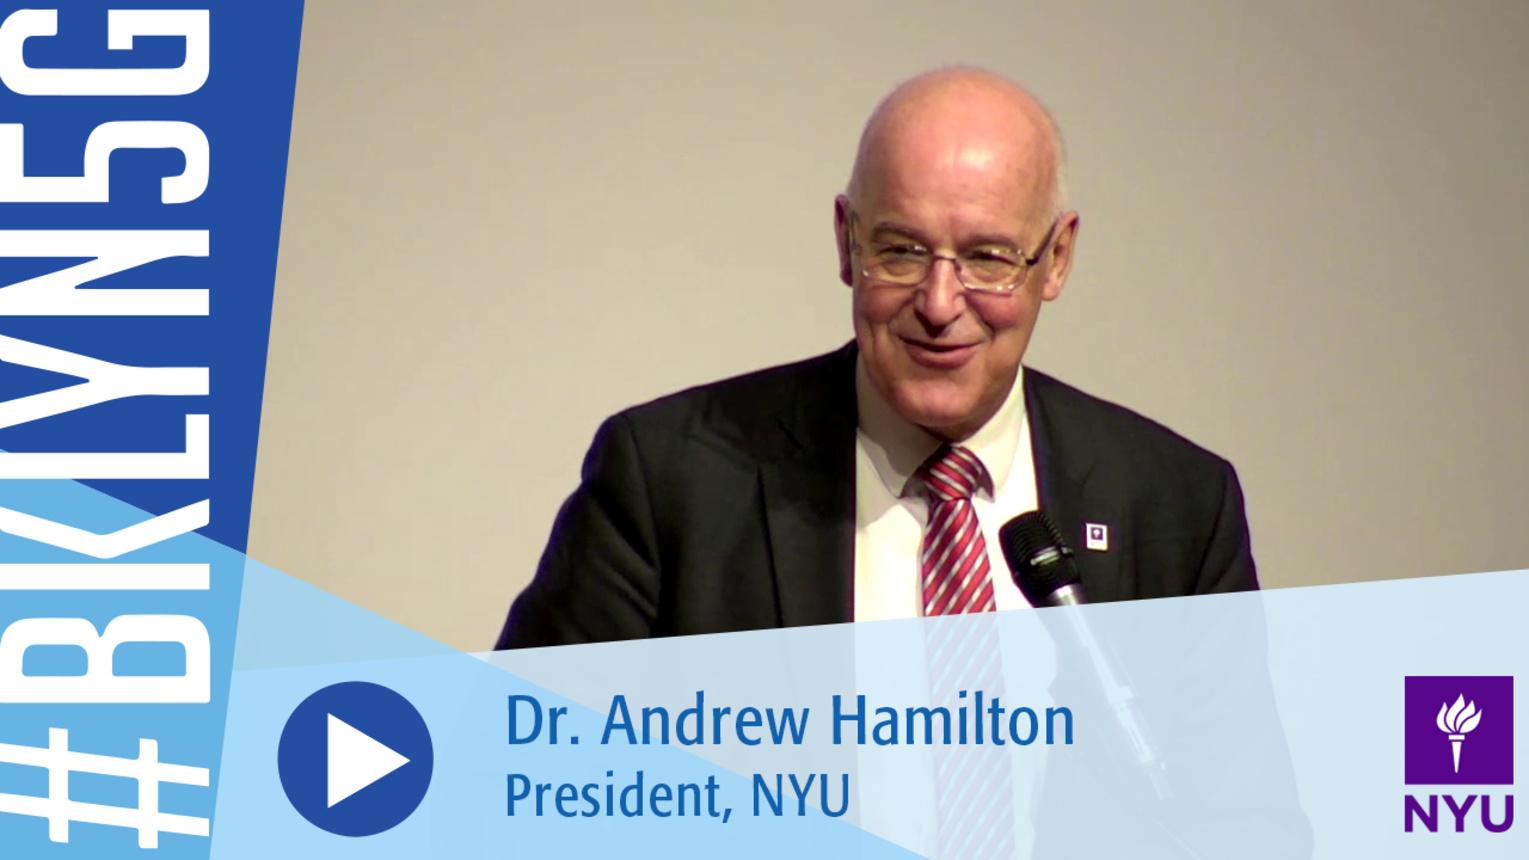 Brooklyn 5G 2016: NYU President Dr. Andrew Hamilton